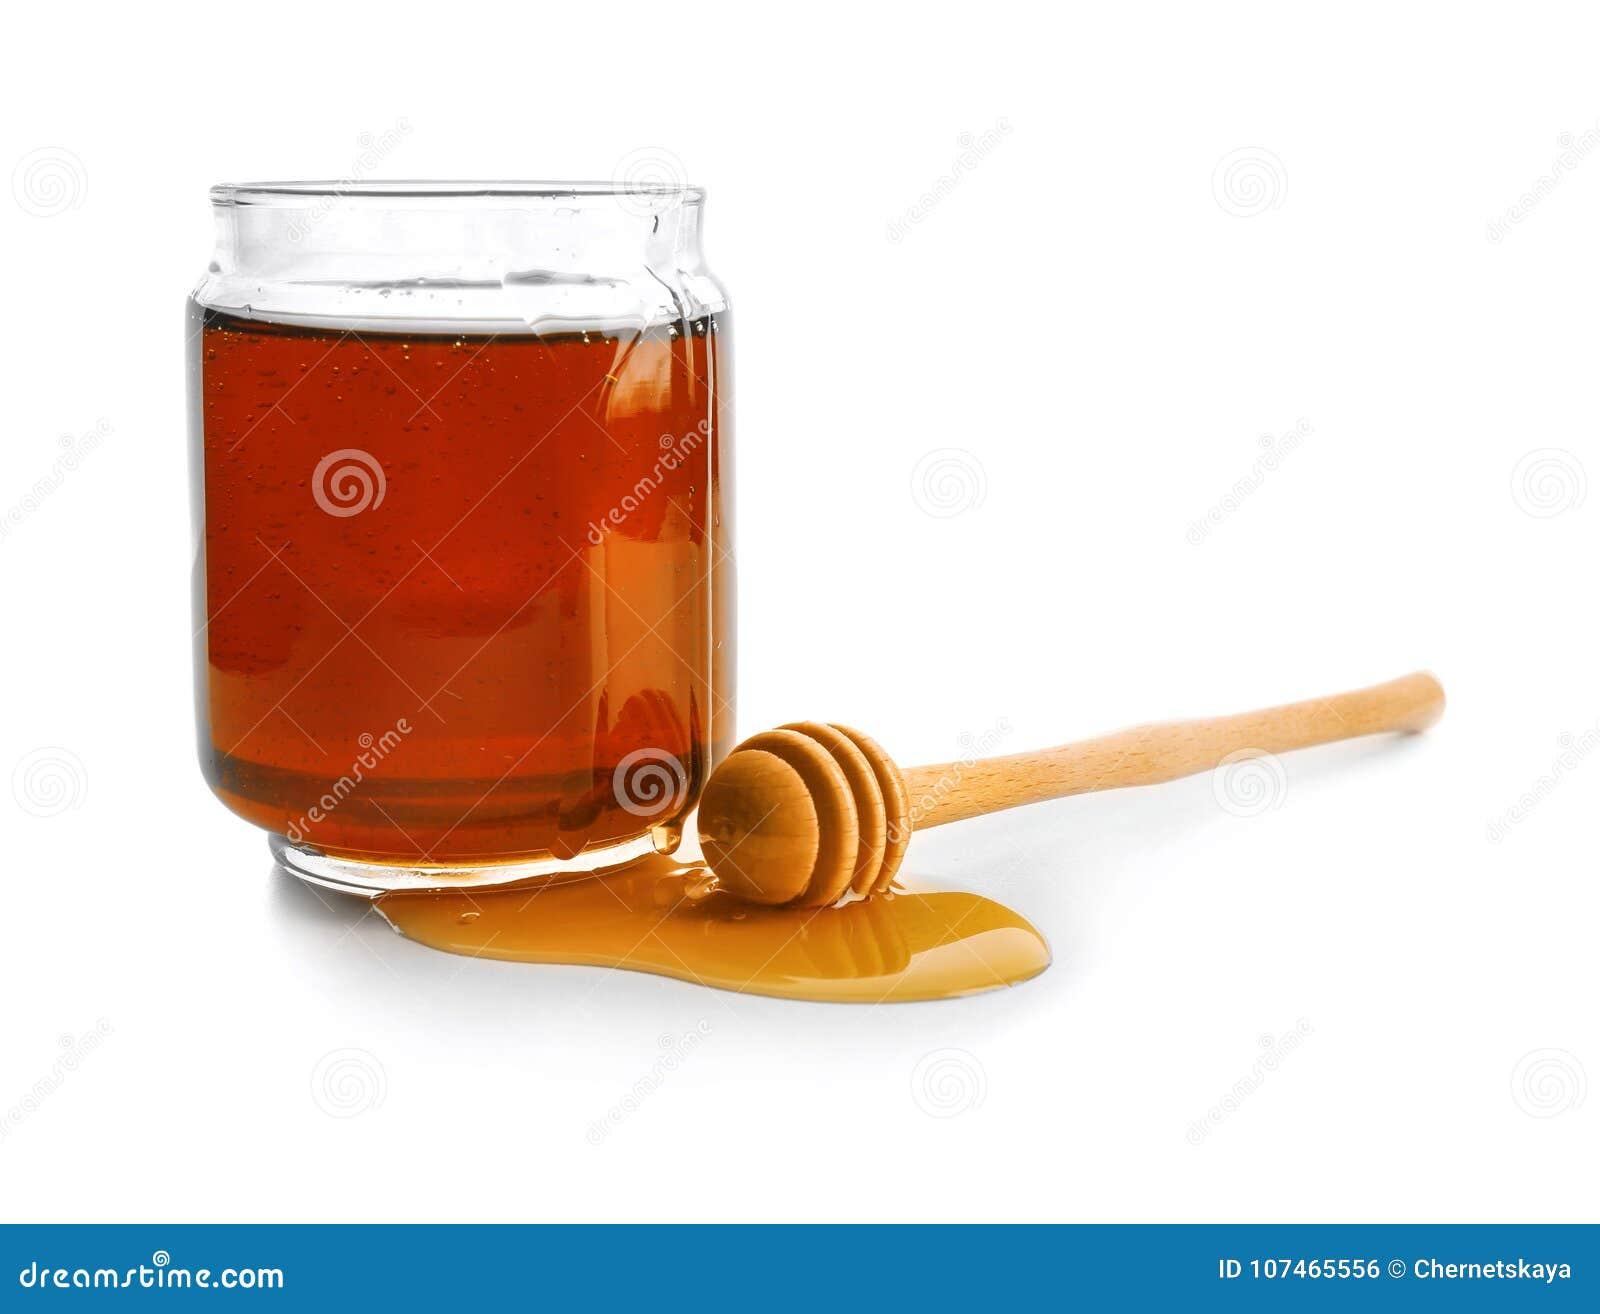 Jar of honey with dipper,